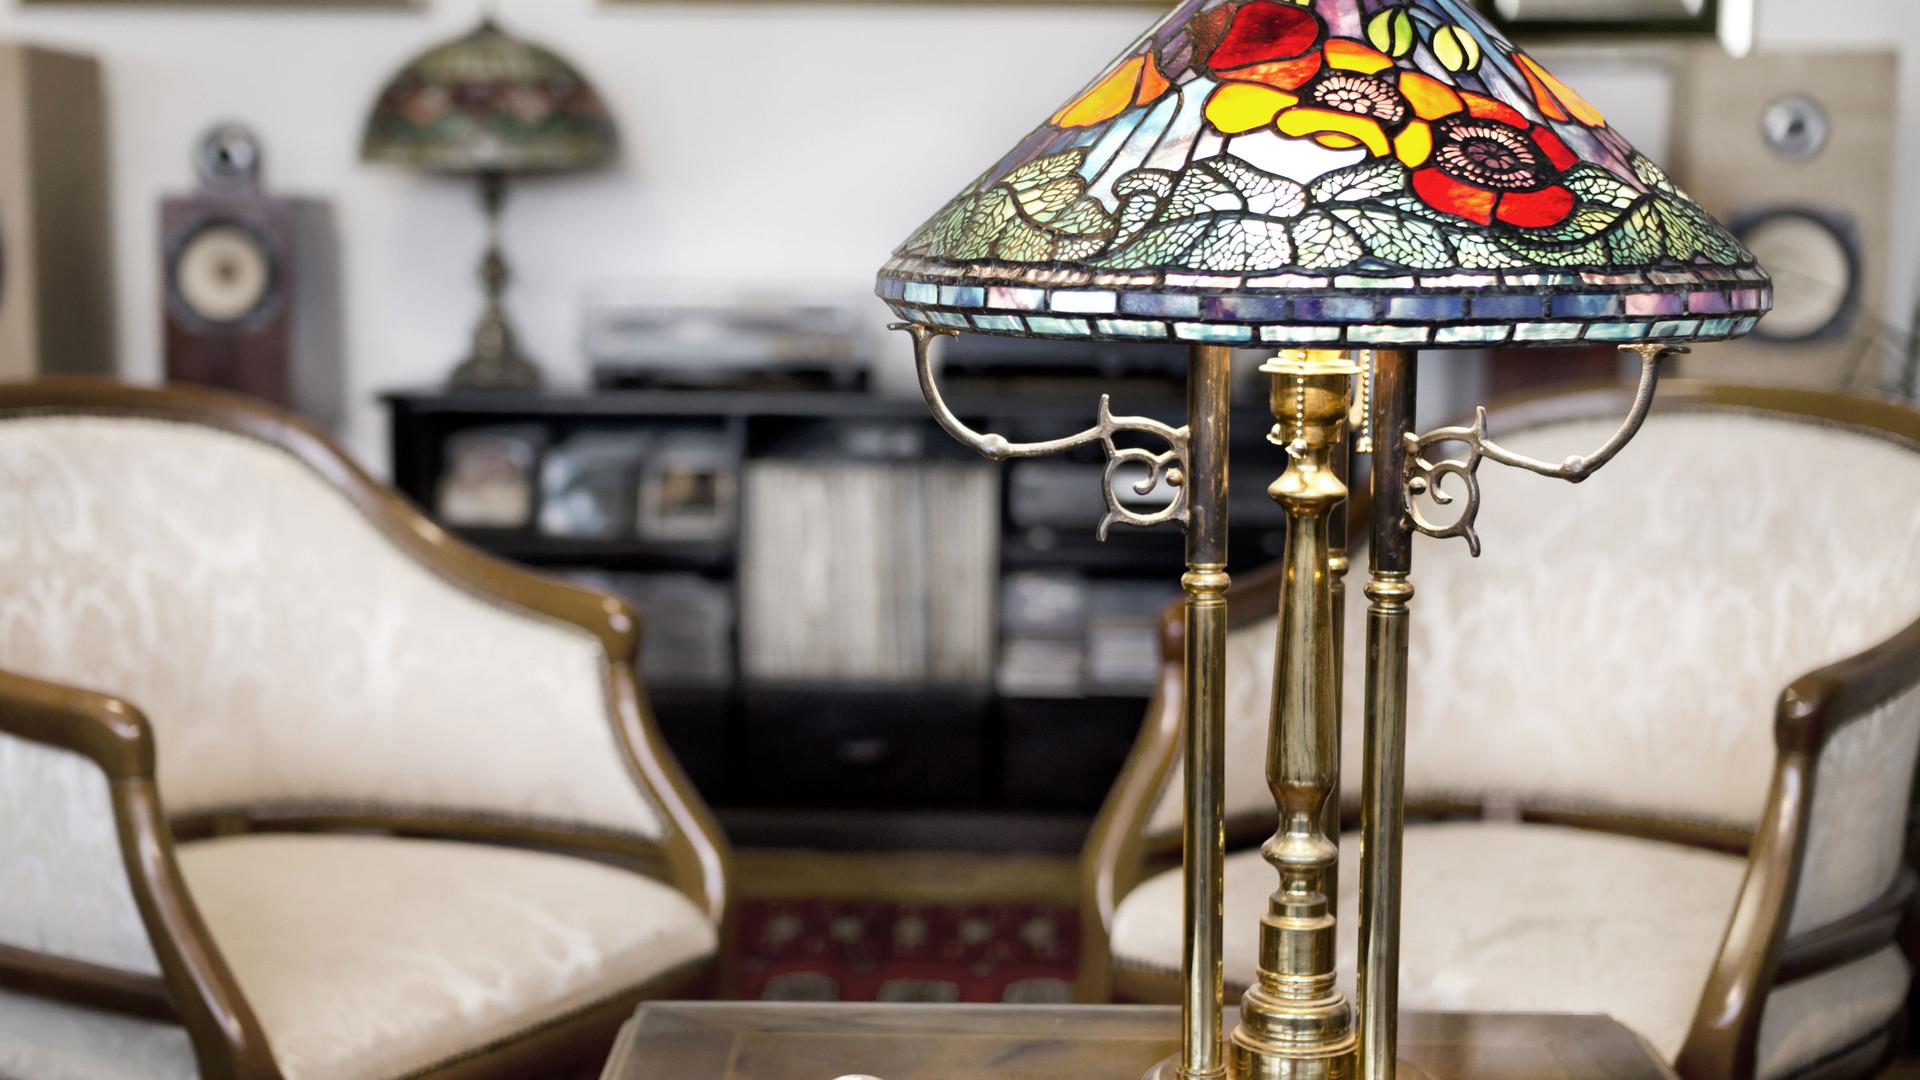 Tiffany Lamps and Decor